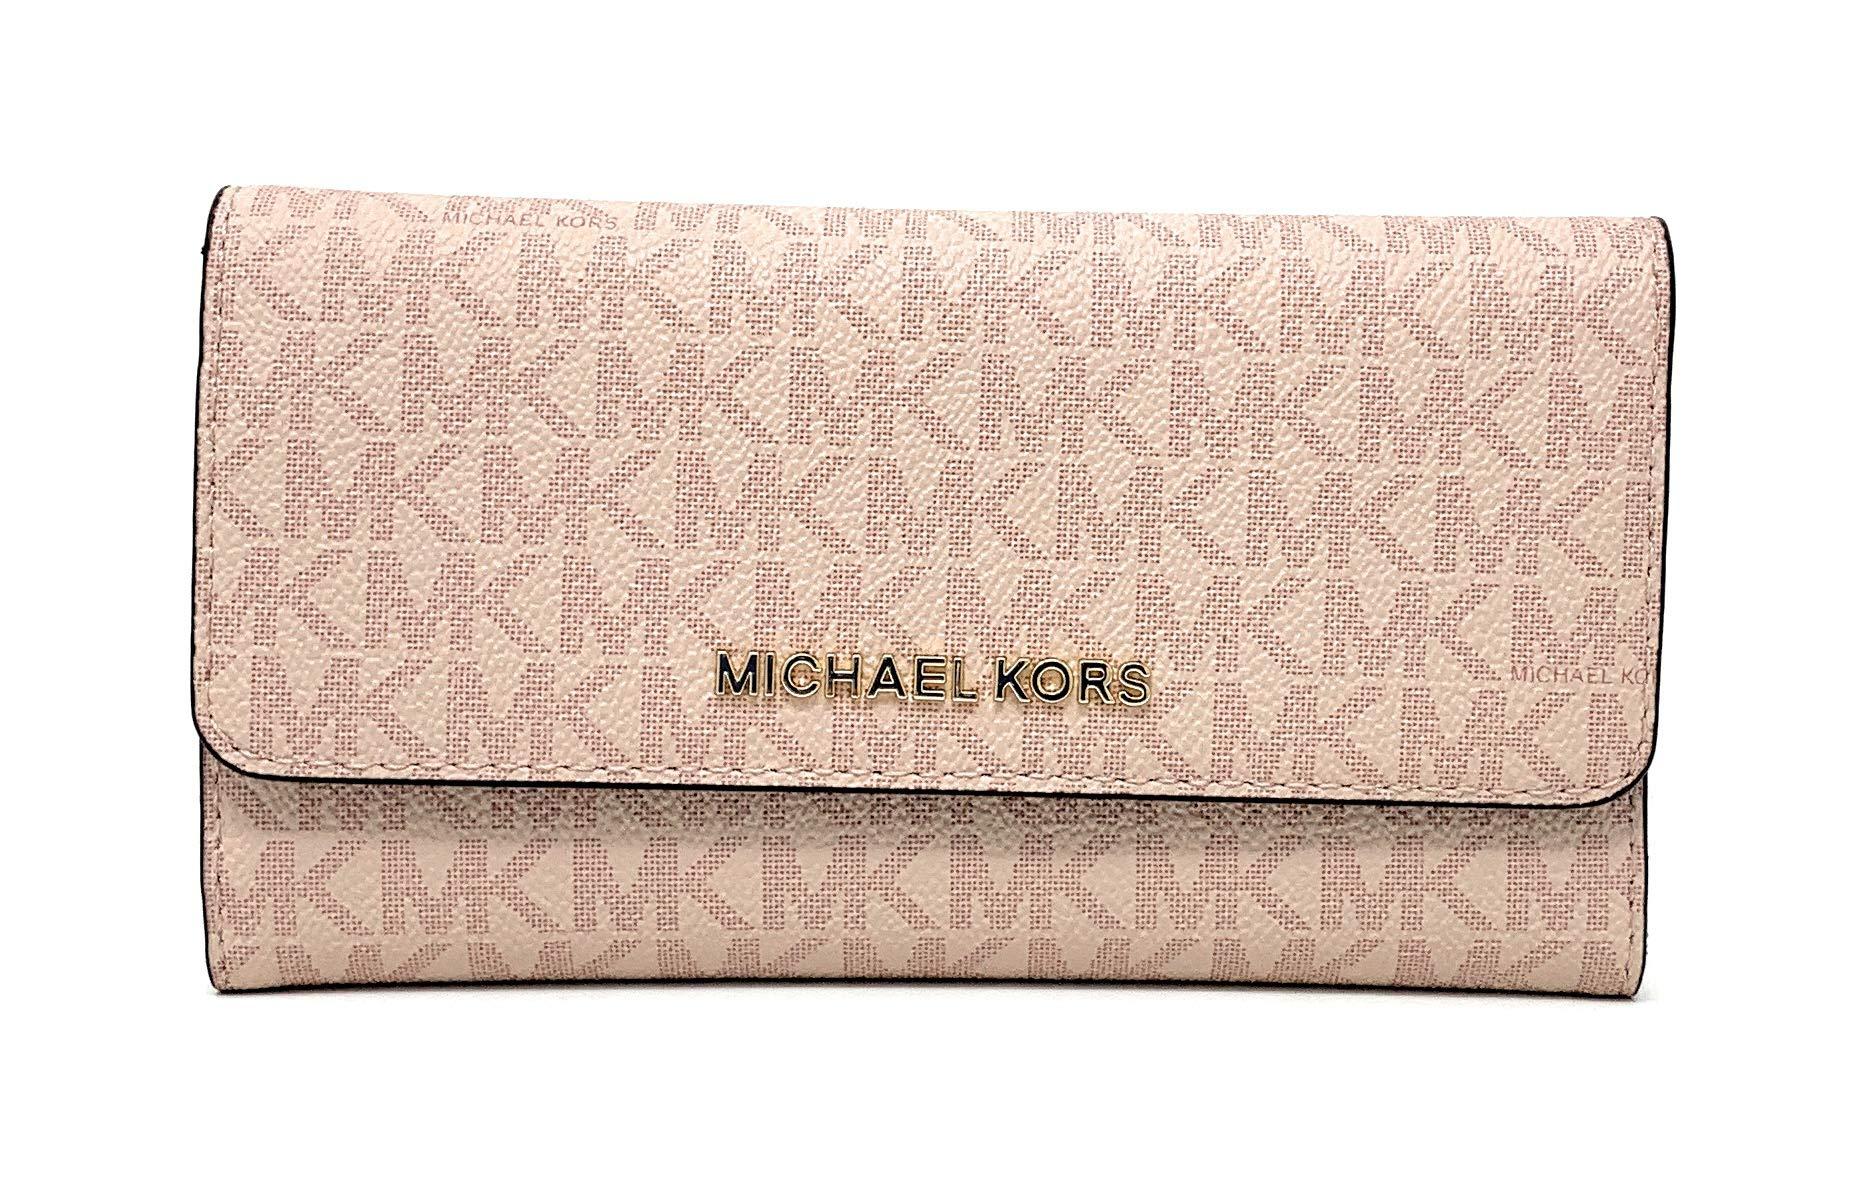 Michael Kors Jet Set Travel Large Trifold Signature PVC Wallet (Fawn/Ballet) by Michael Kors (Image #1)